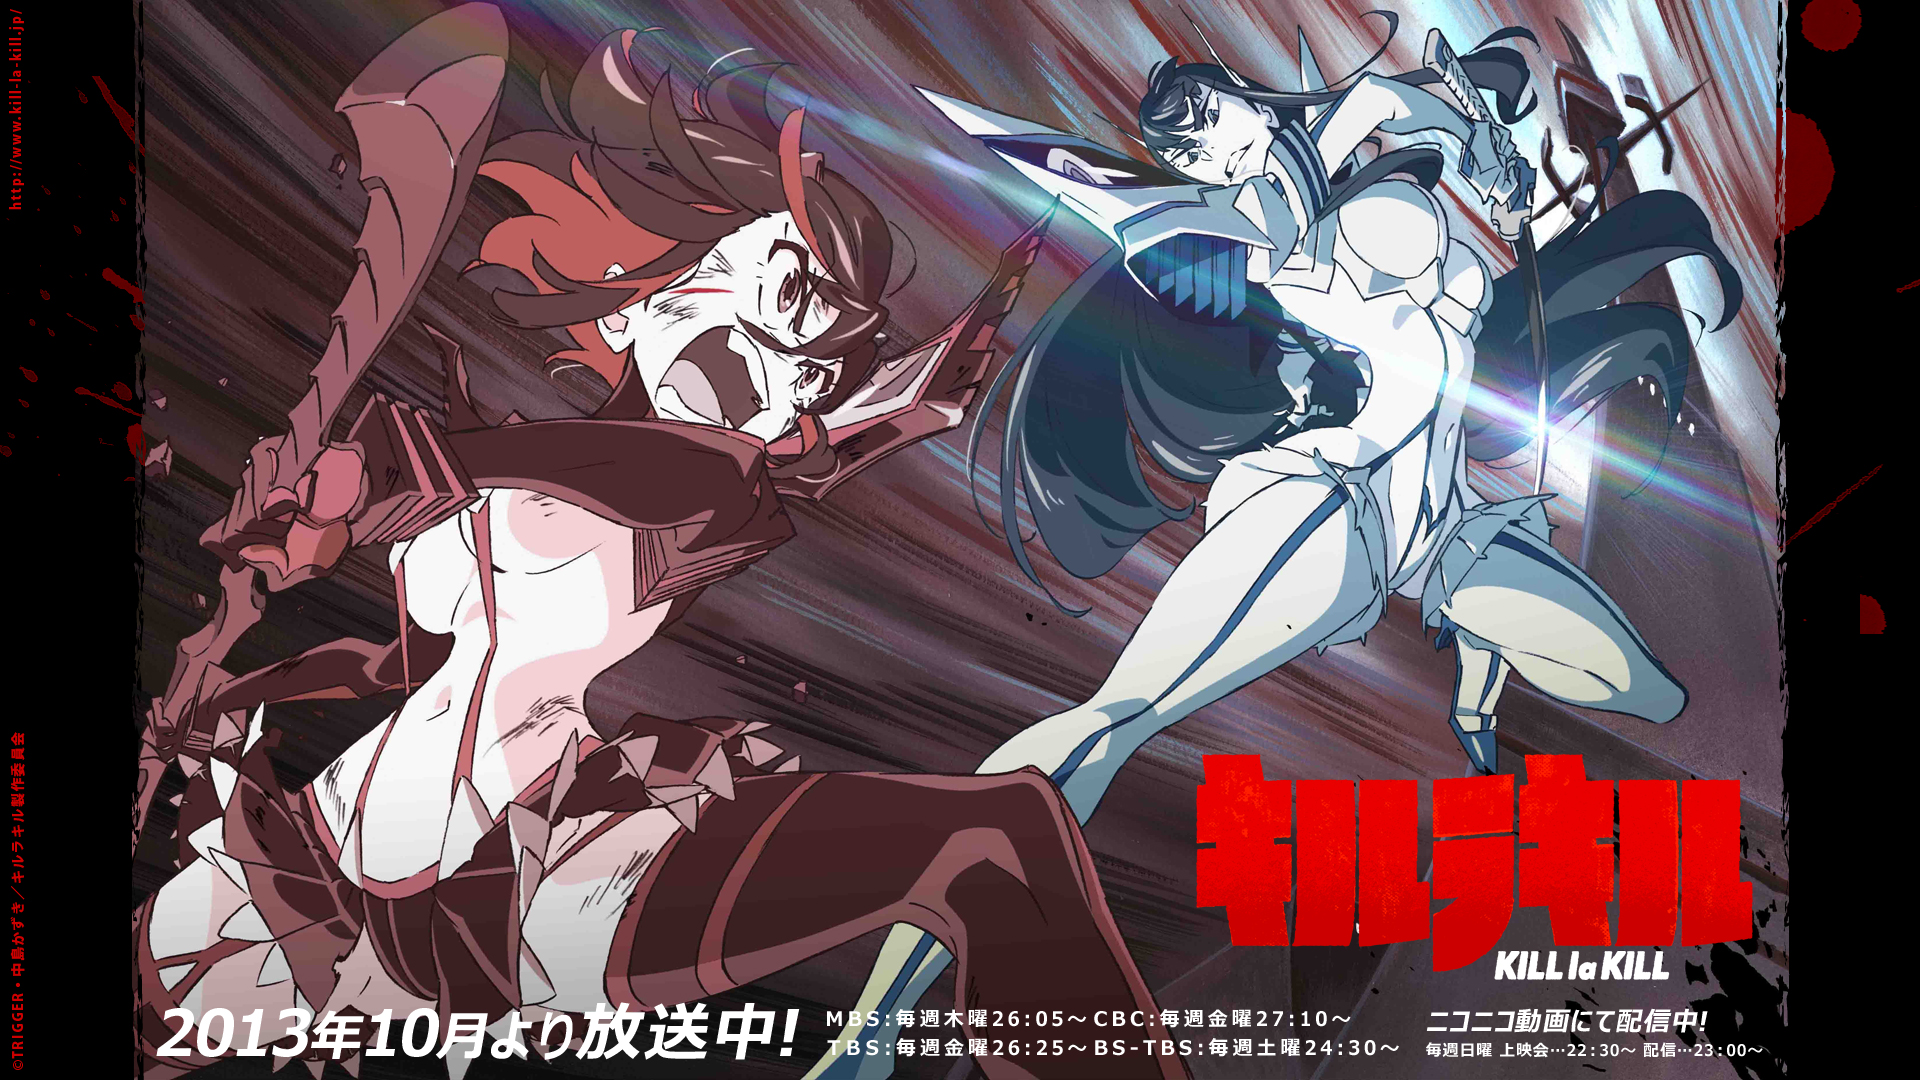 Anime Kill La Kill 30 Hd Wallpaper Animewp Com